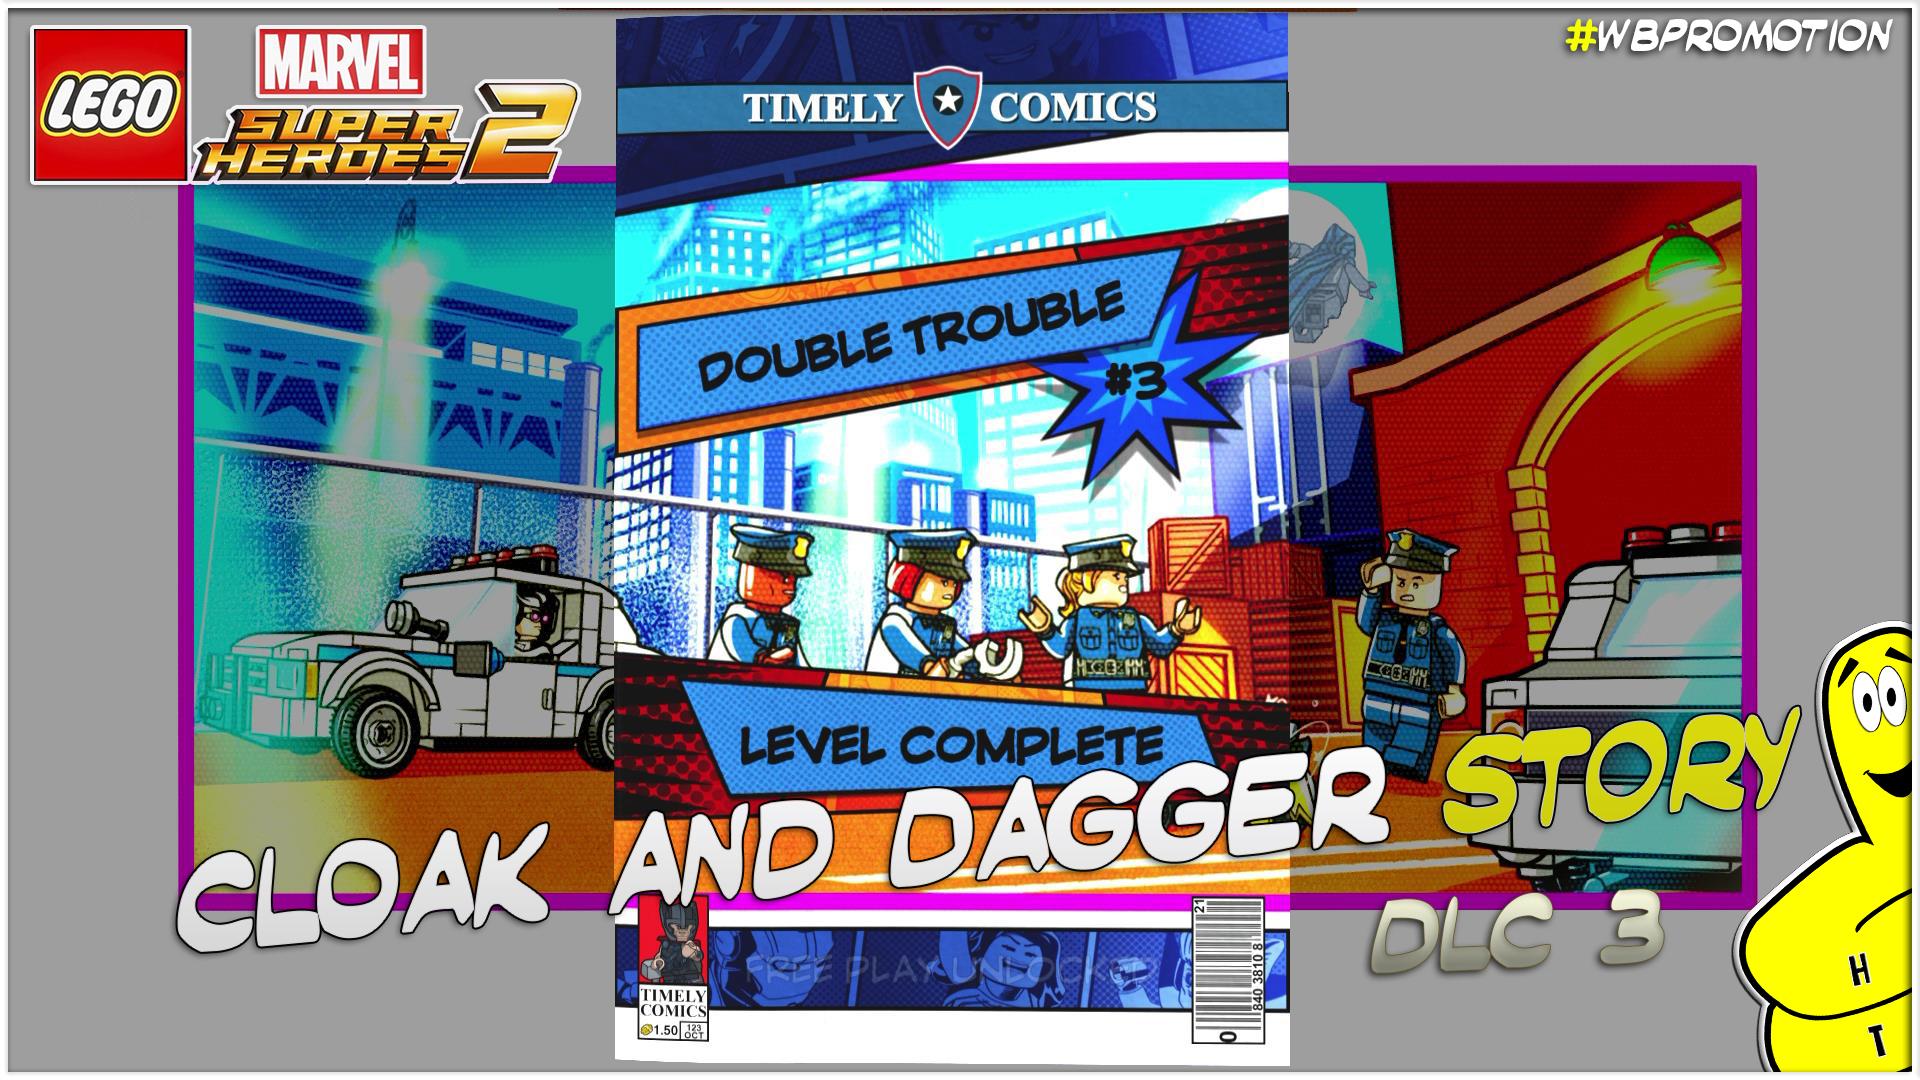 STORY DLC Level 3 Thumb